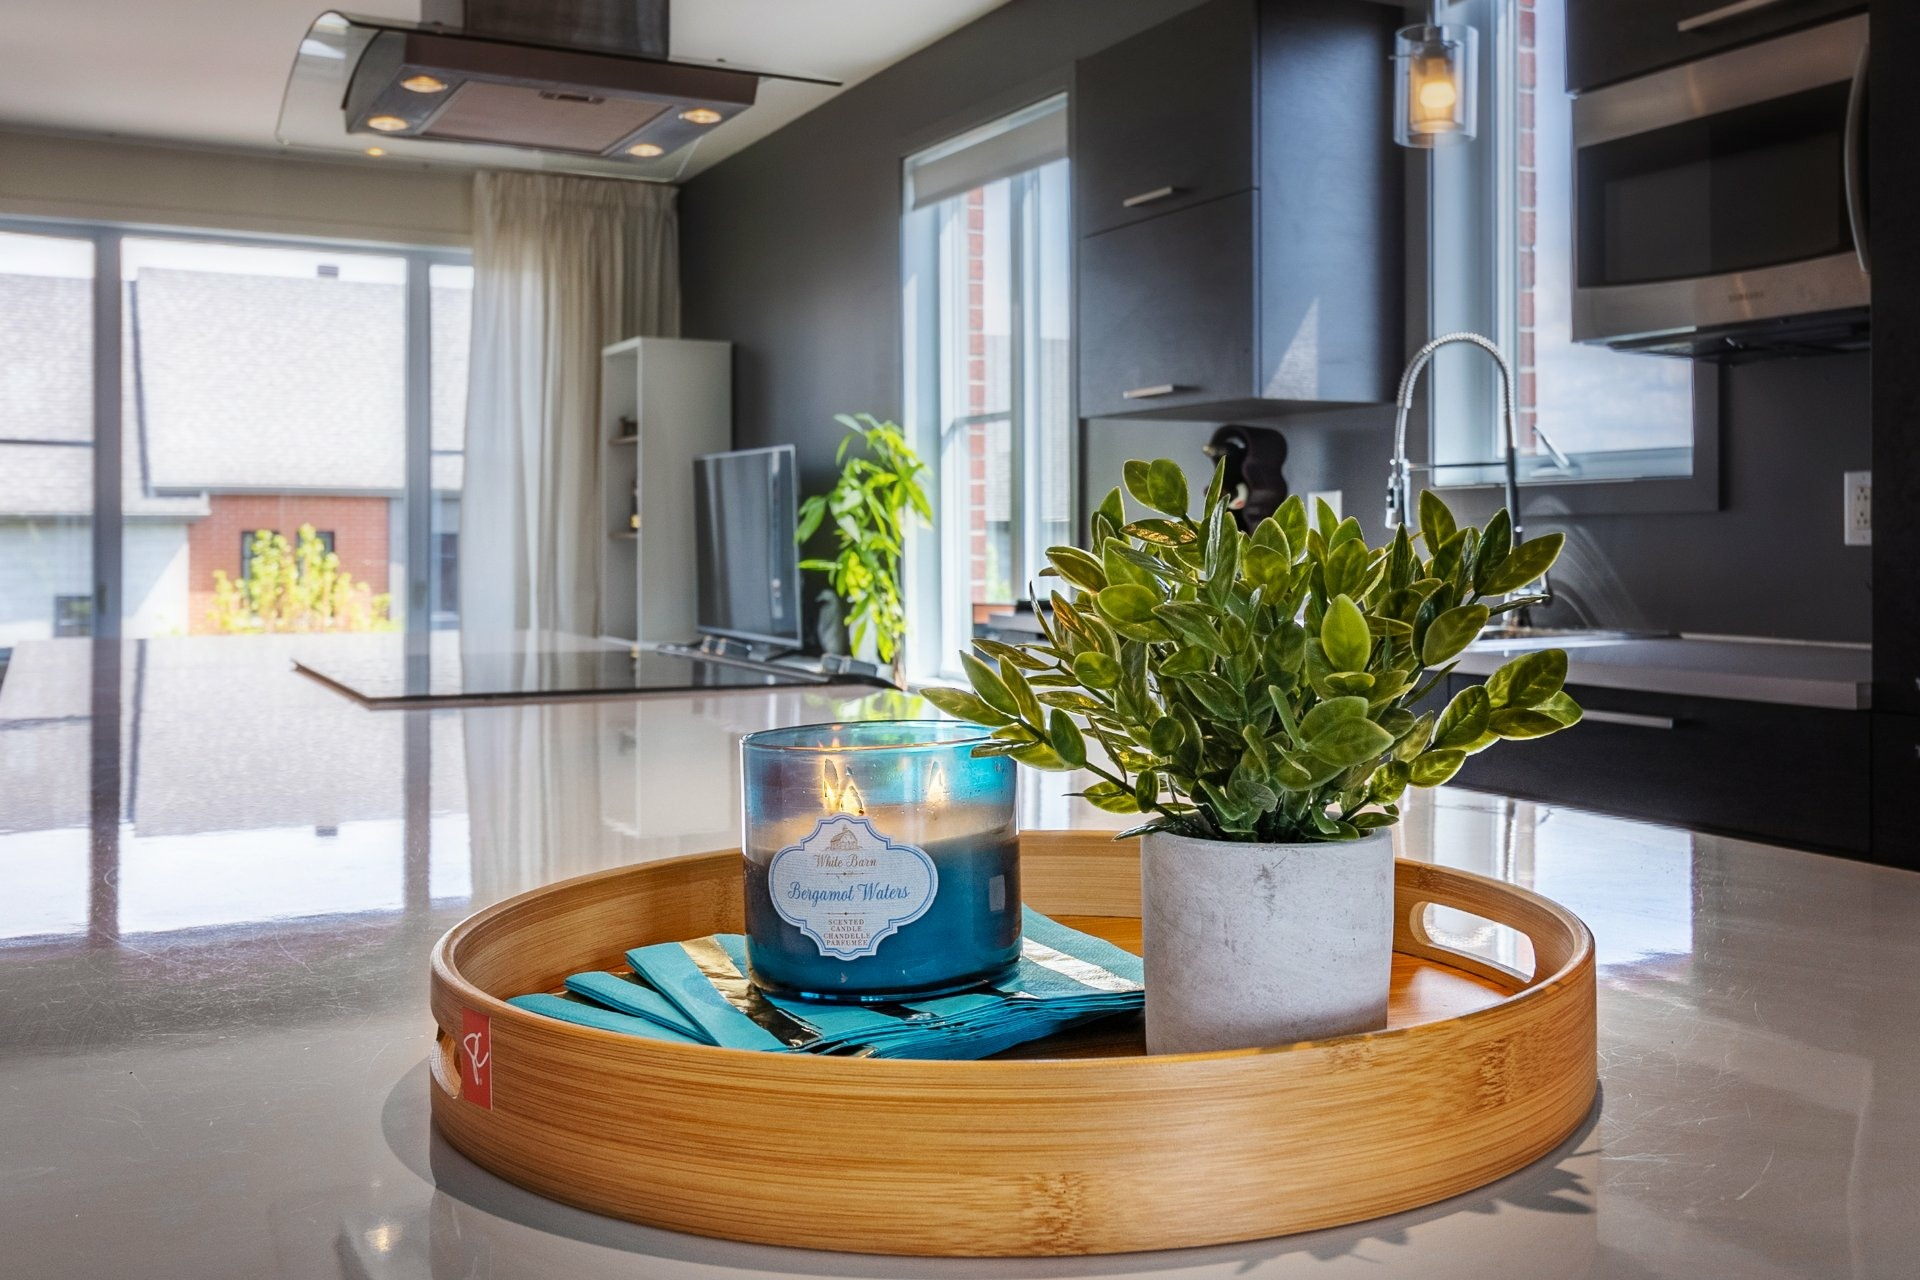 image 11 - Apartment For sale Saint-Hubert Longueuil  - 7 rooms